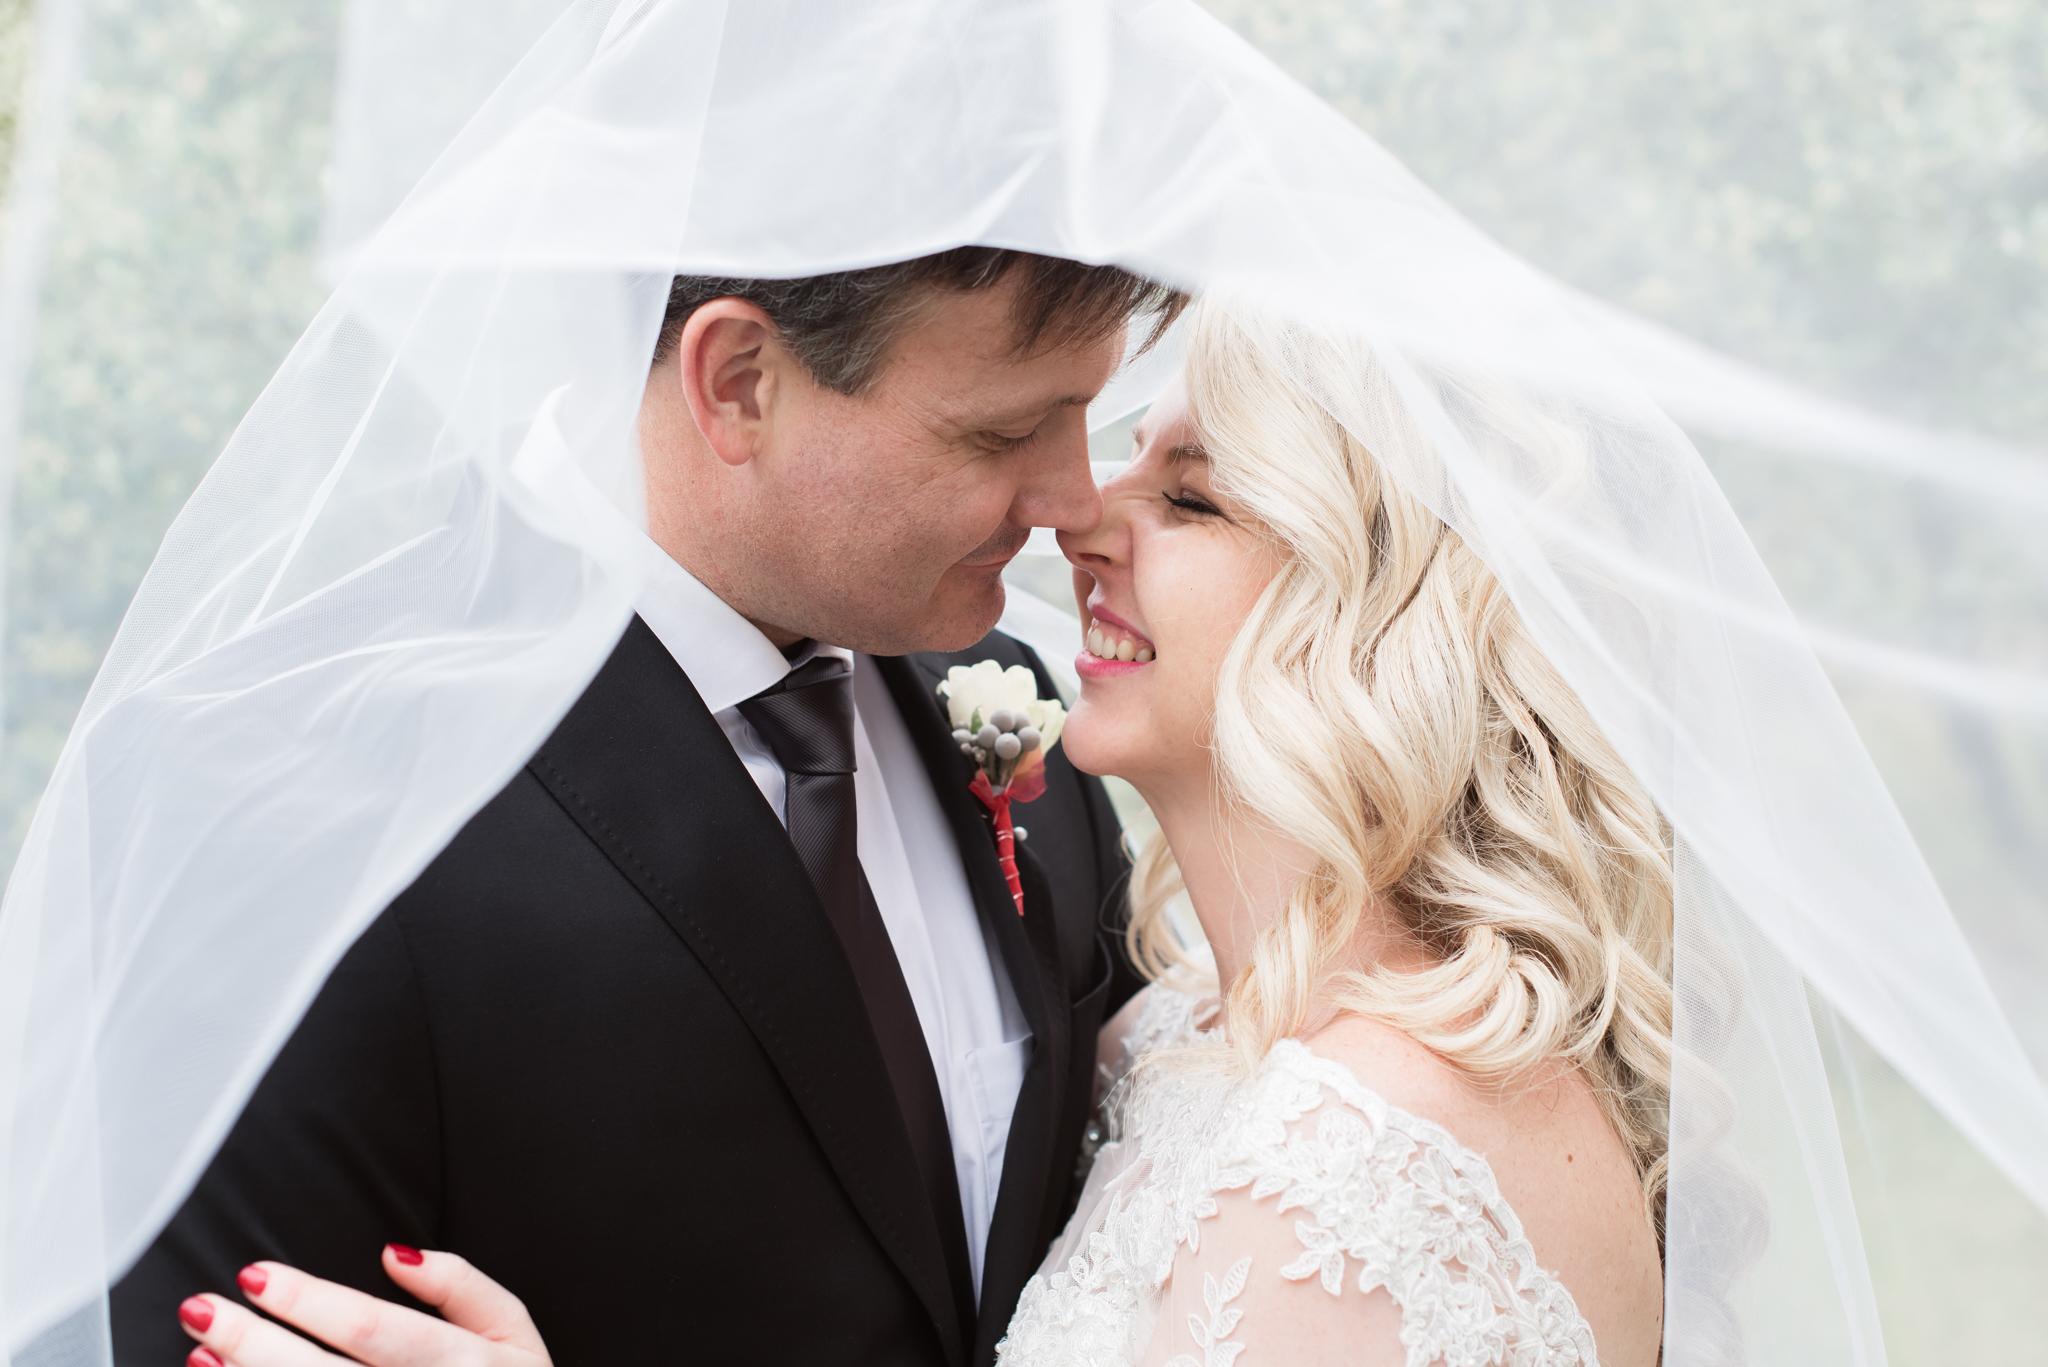 Angelique_Smith_Photography_Pieter&Yvonne_Wedding-390.jpg